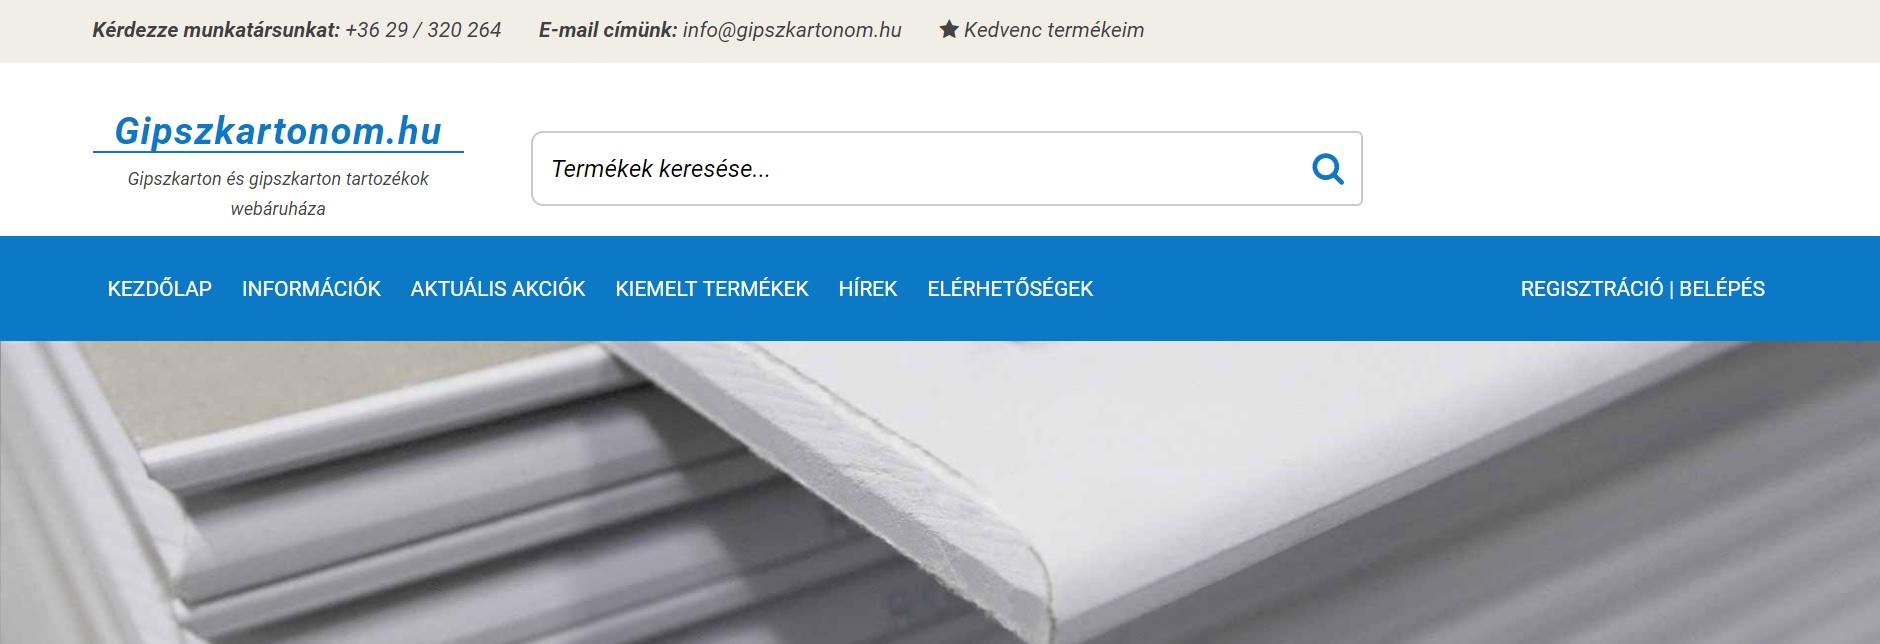 Gipszkartonom.hu - Gipszkarton webáruház